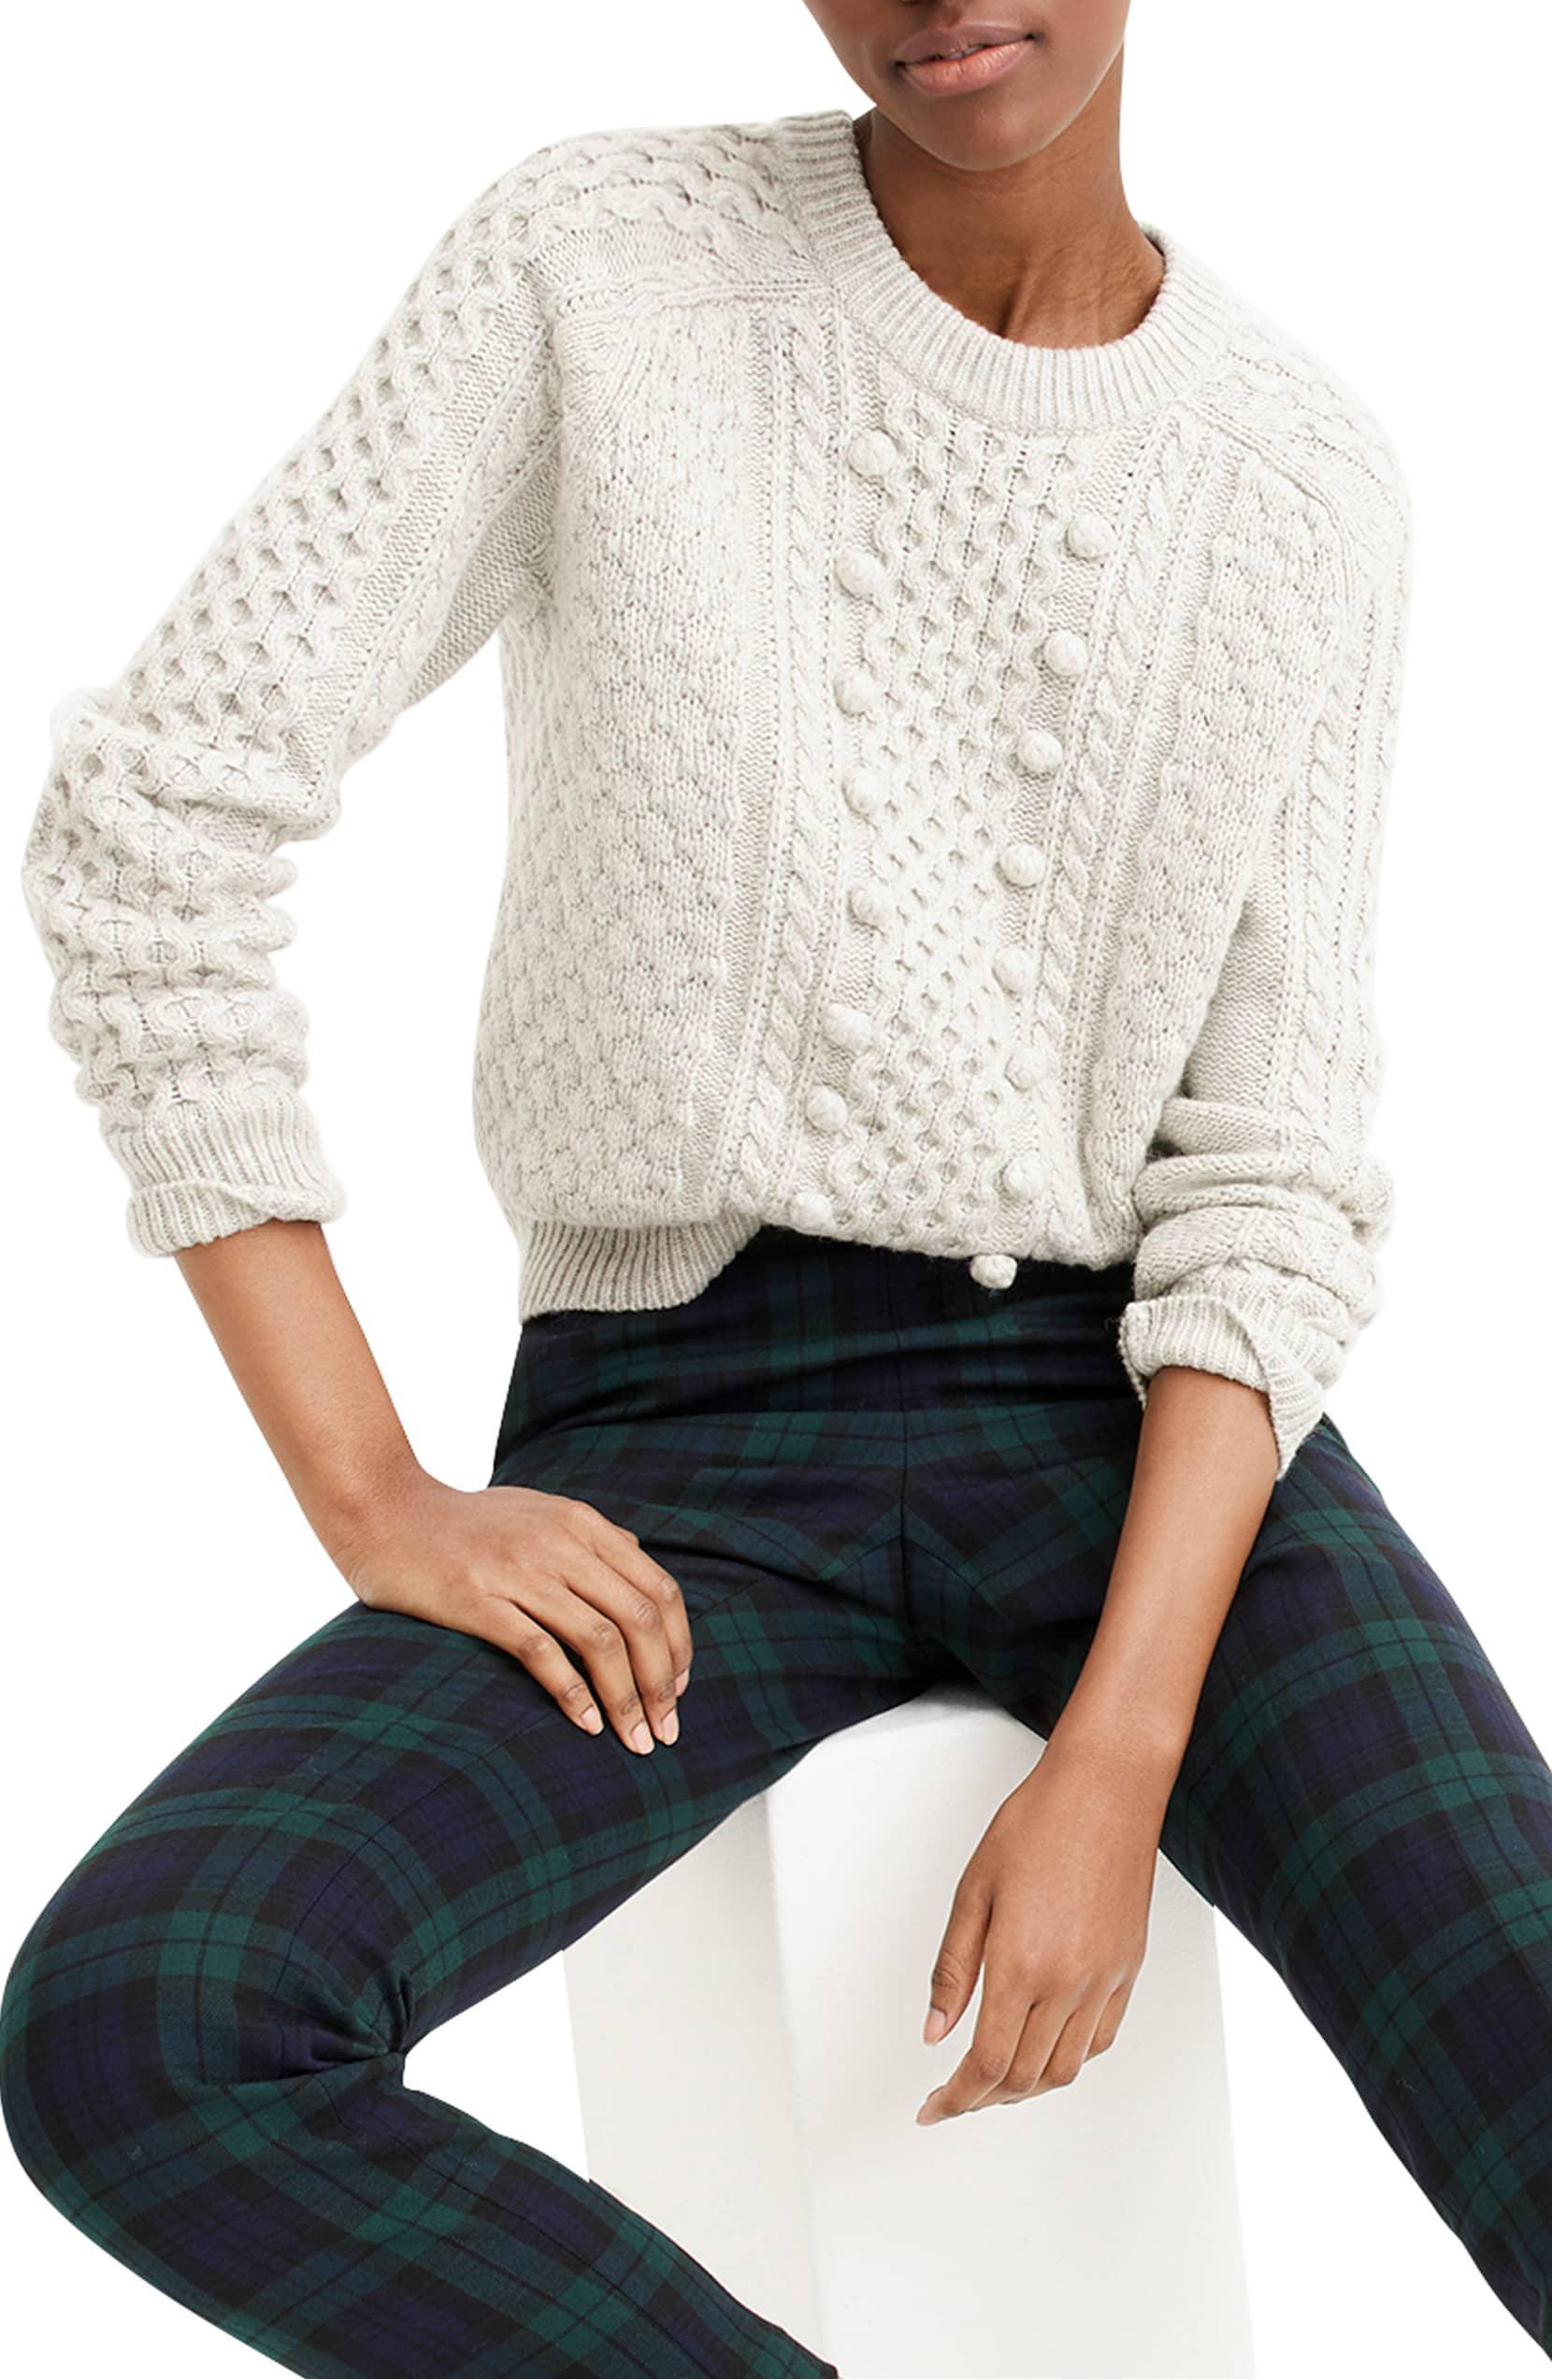 JCrew Popcorn Cable Knit Sweater